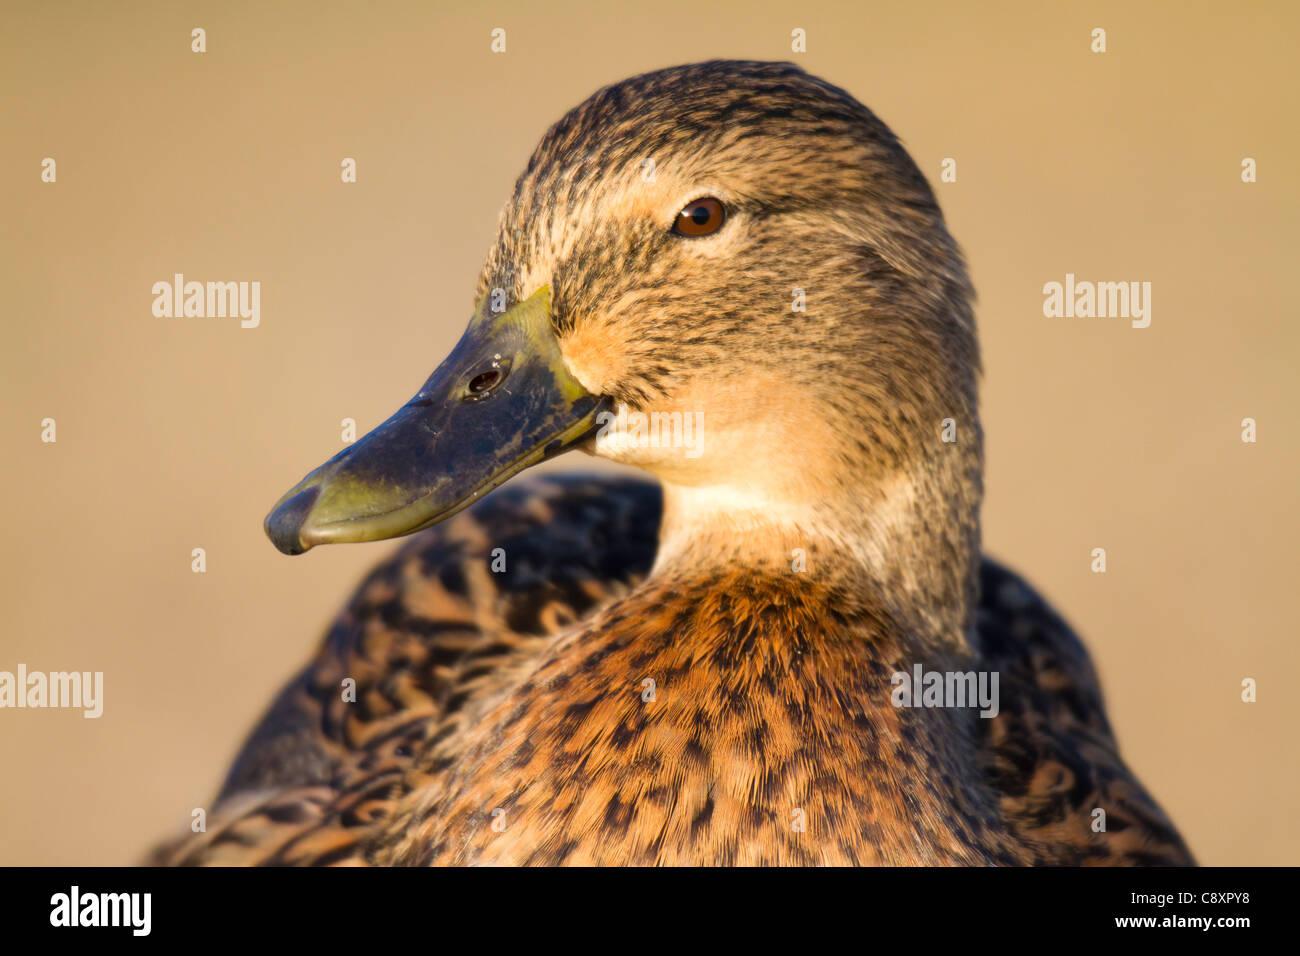 close-up of head of a female Mallard (Anas platyrhynchos) - Stock Image